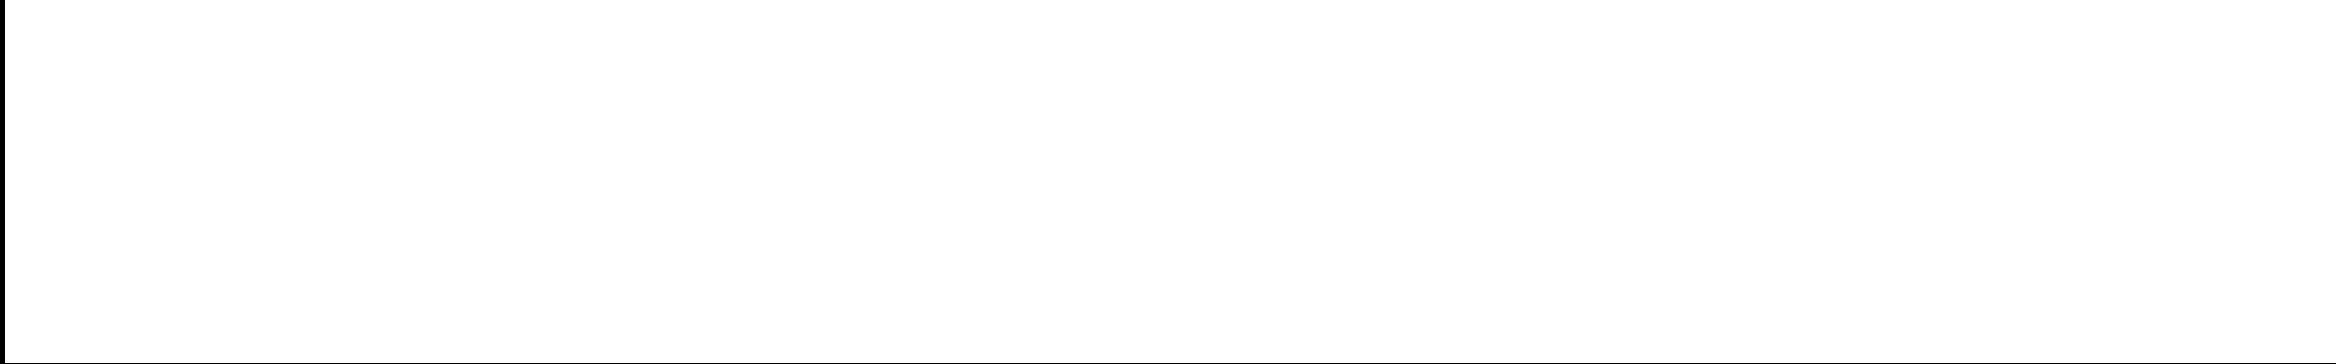 carina-brinkmann.com